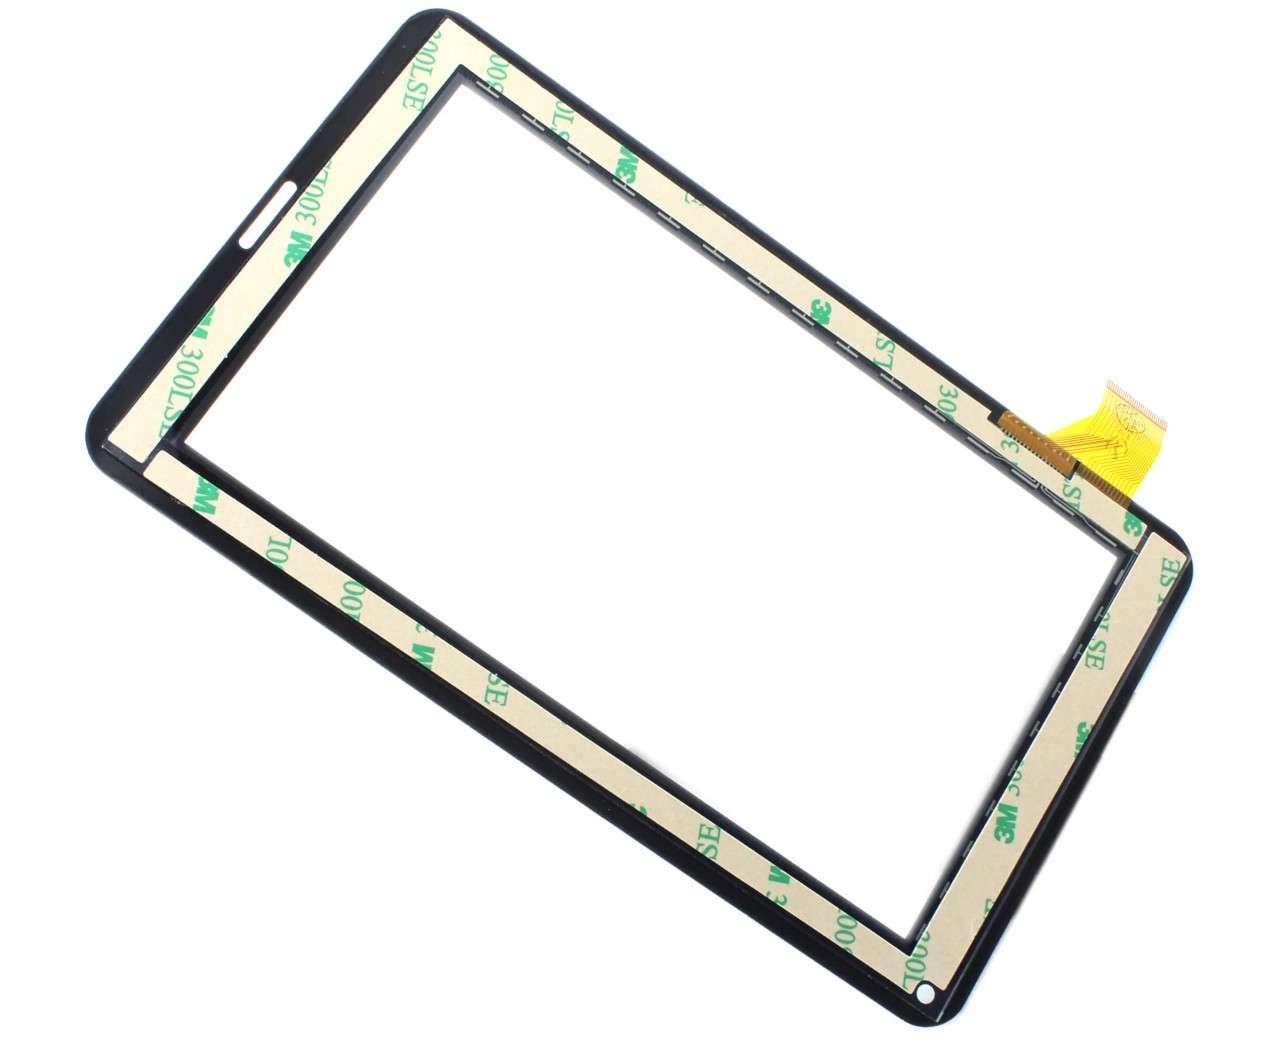 Touchscreen Digitizer FX2 PAD7 RK2926 Geam Sticla Tableta imagine powerlaptop.ro 2021